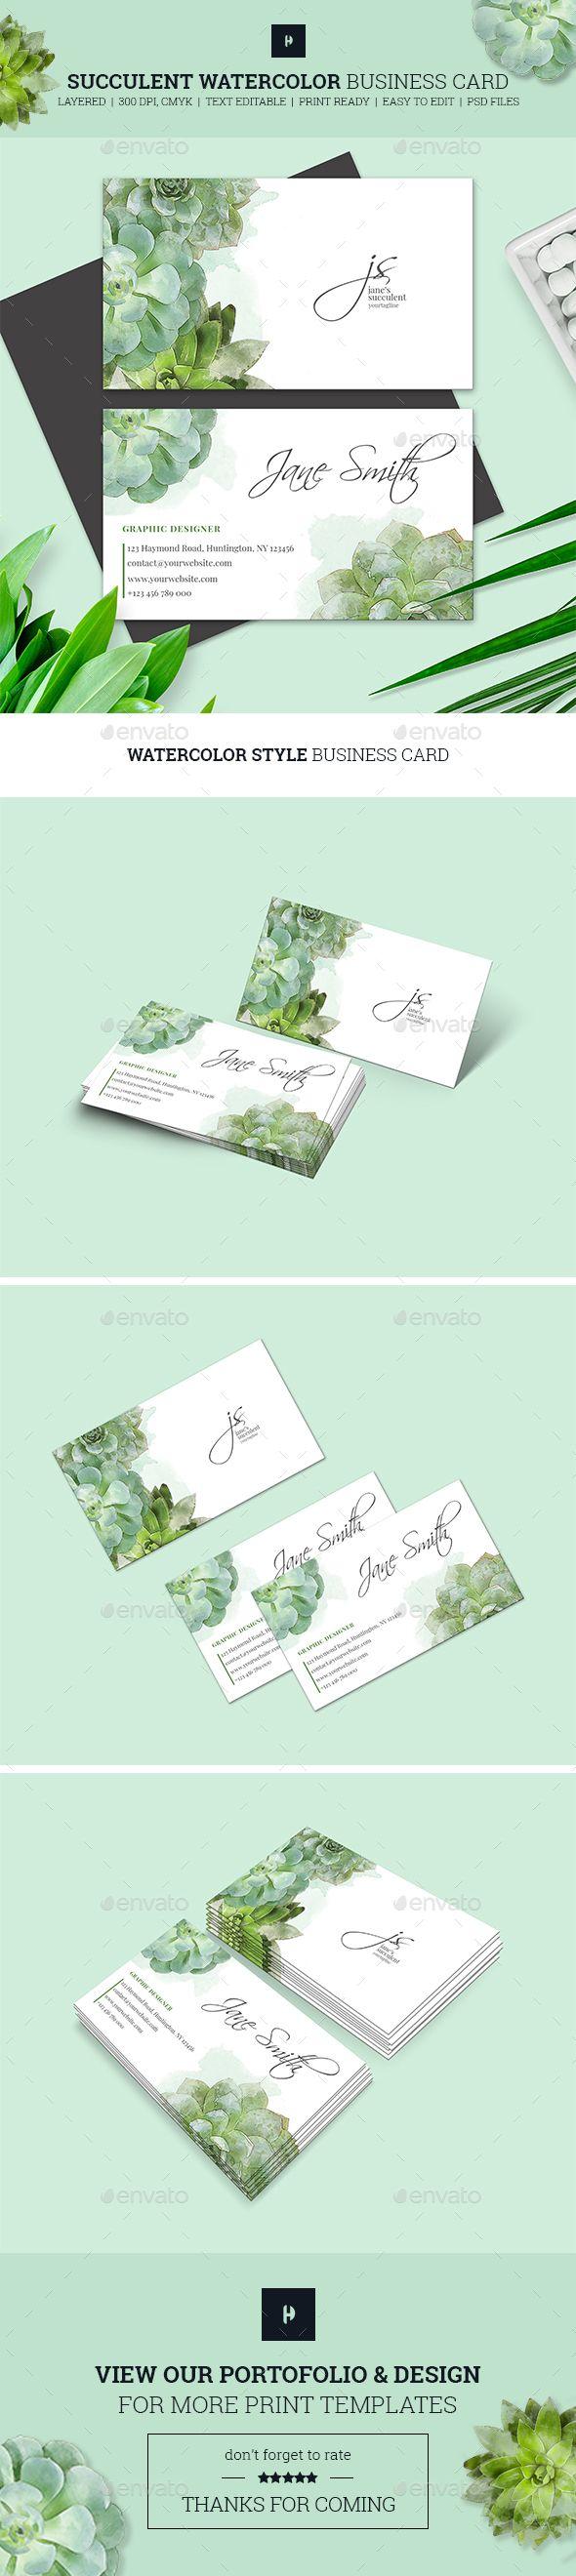 The 25+ best Business card templates ideas on Pinterest   Business ...